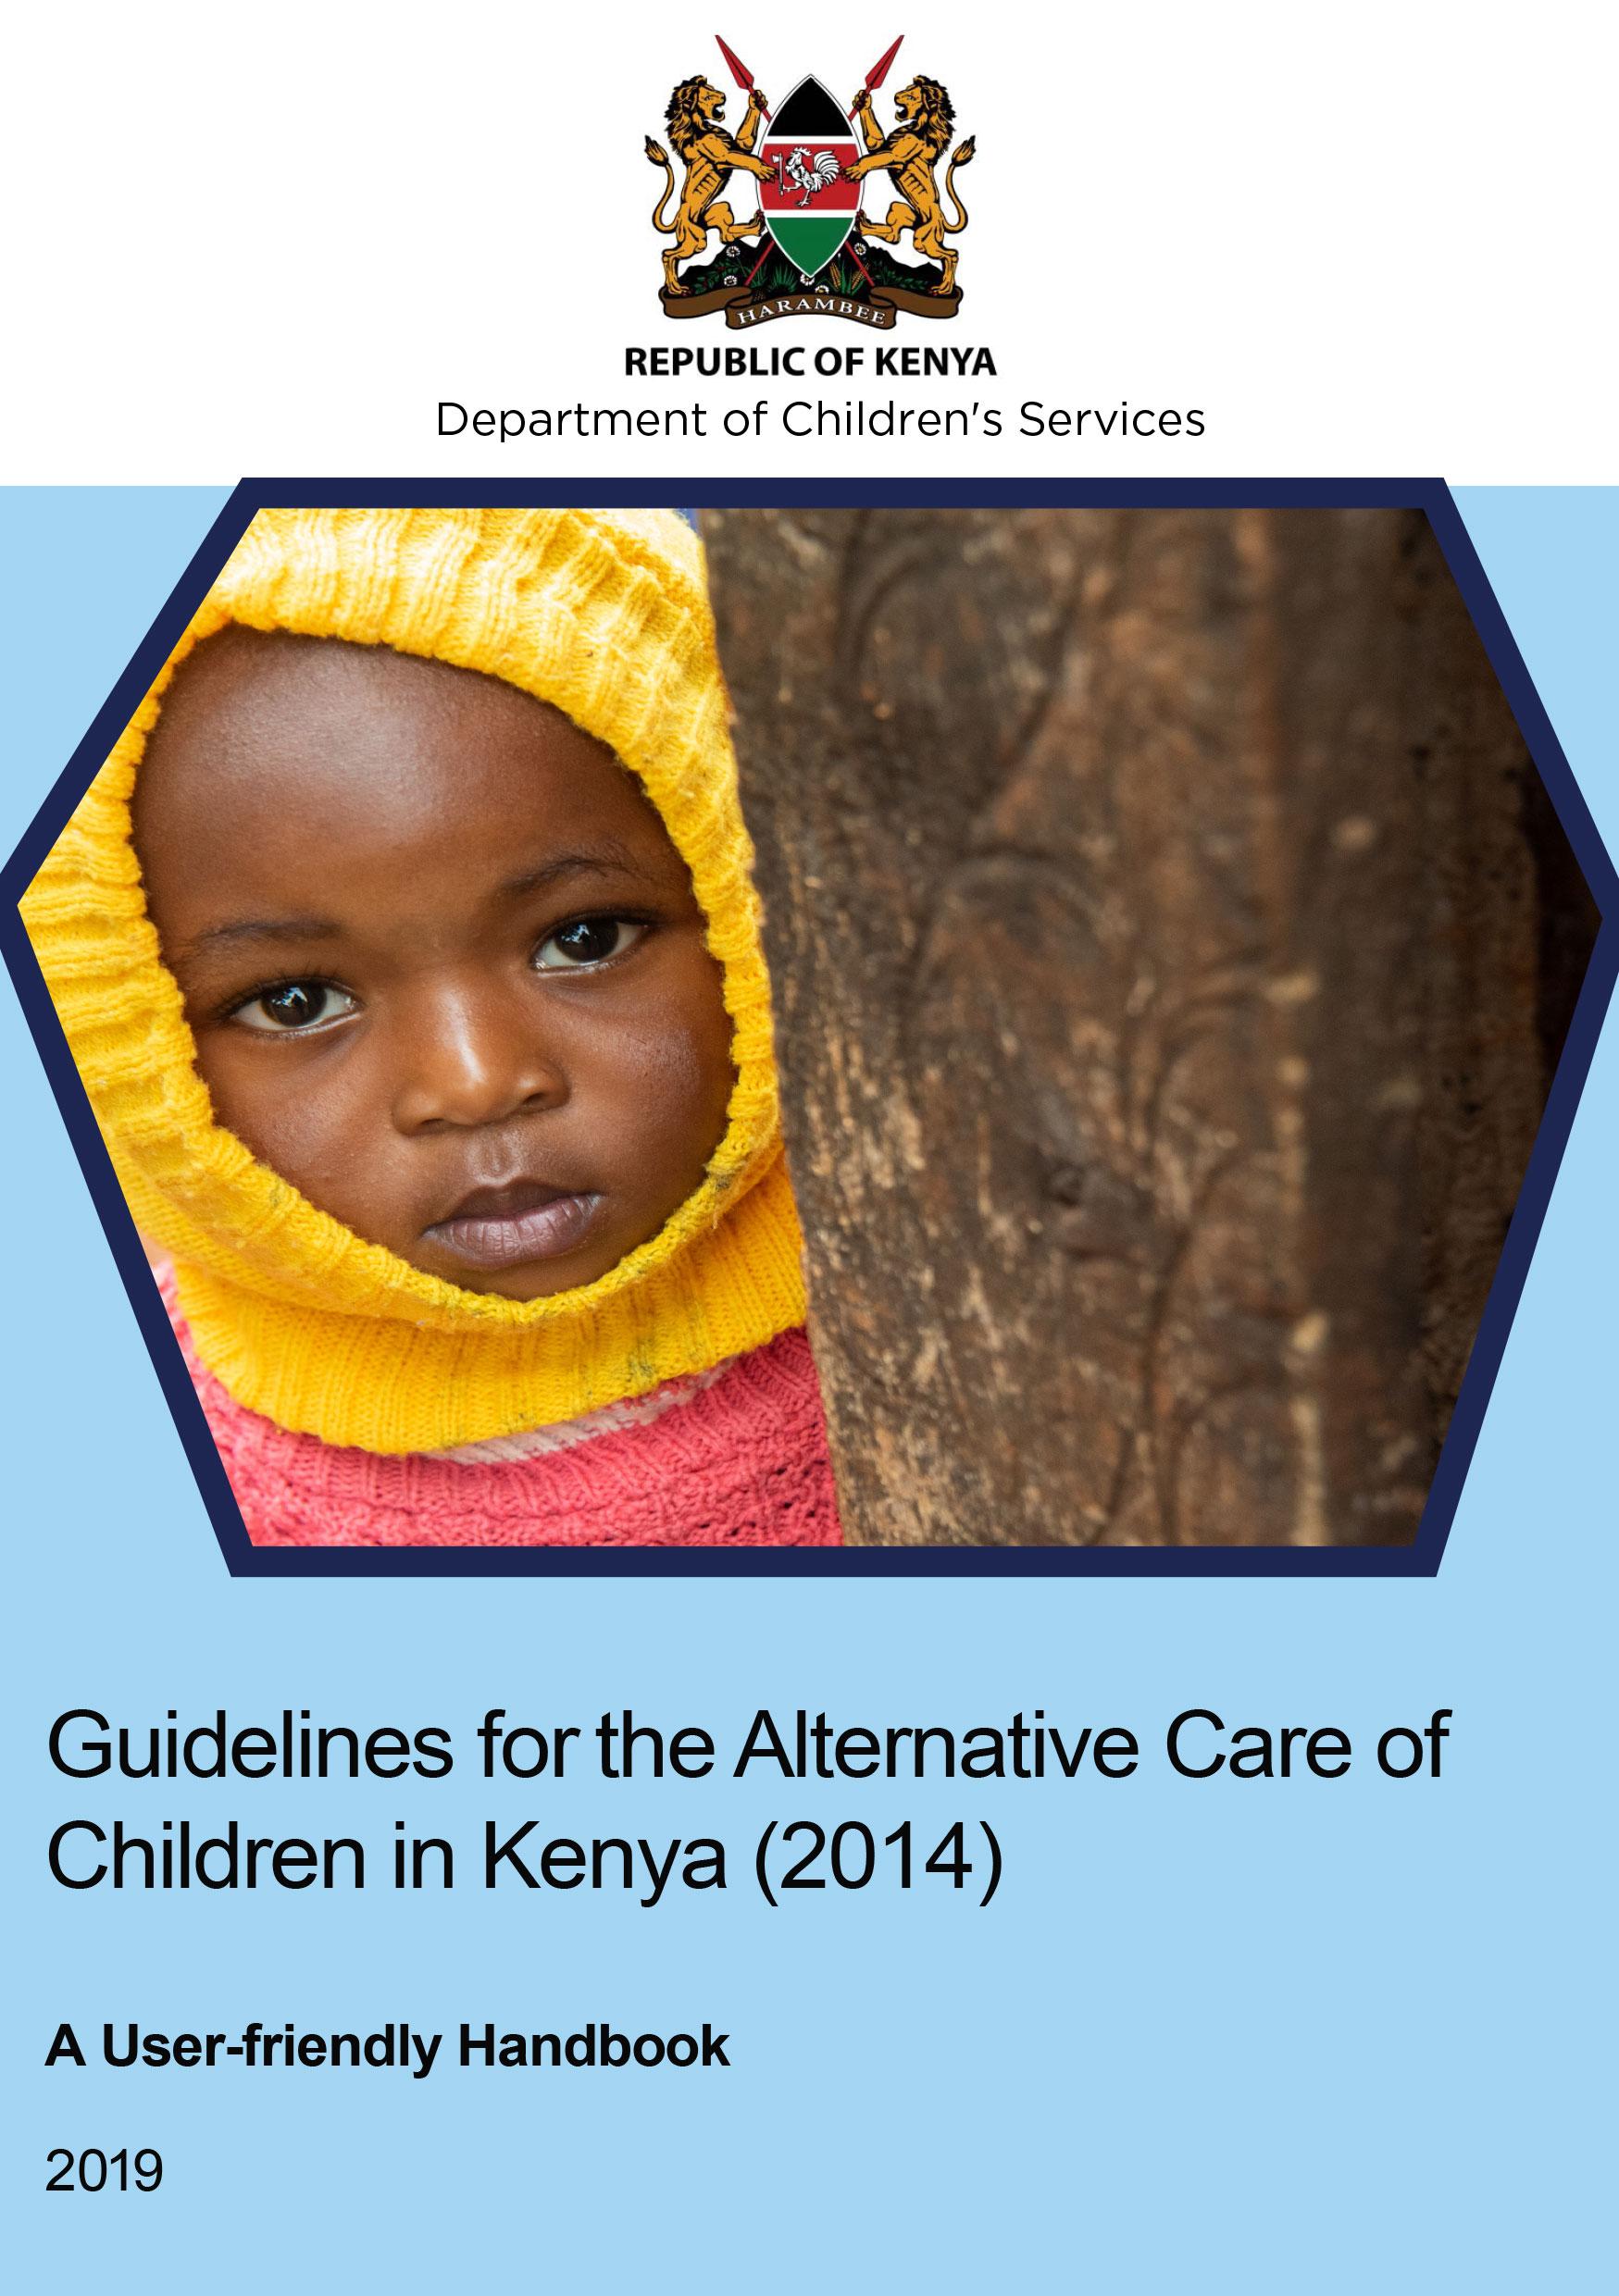 Guidelines for the Alternative Care of Children in Kenya (2014)